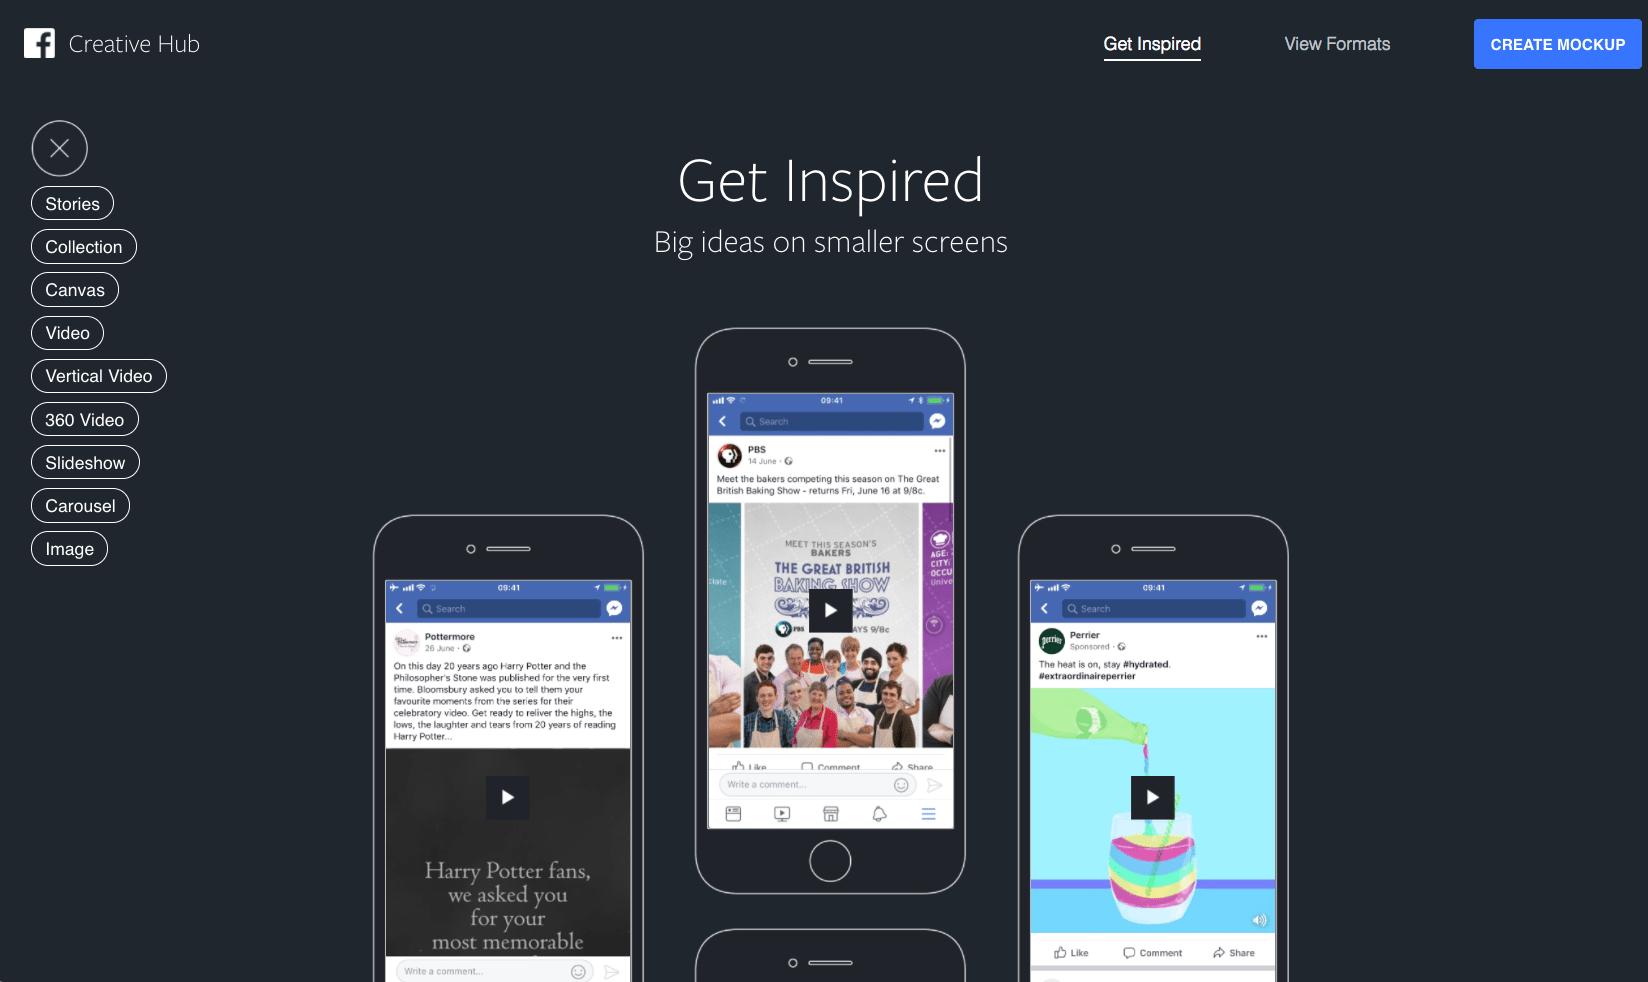 Facebook Creative Hub